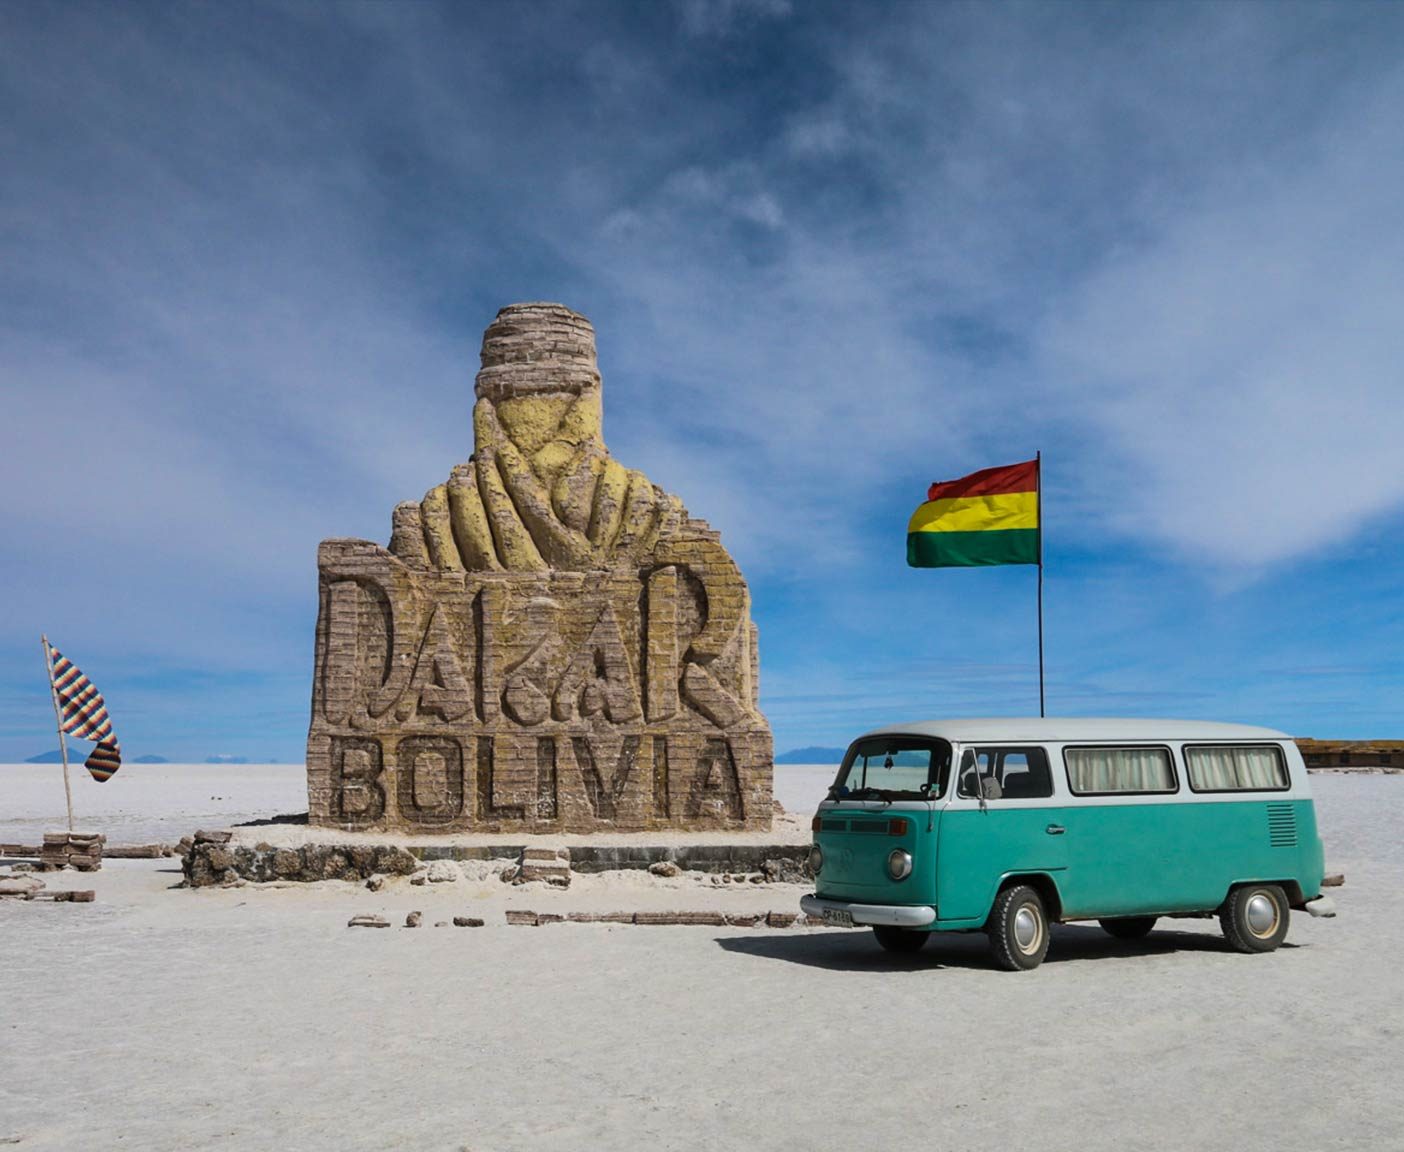 vw-t2-bus-bulli-kaufen-volkswagen-transporter-oldtimer-bully-camper-westfalia-van-i-come-around-doka-gebraucht-samba-5